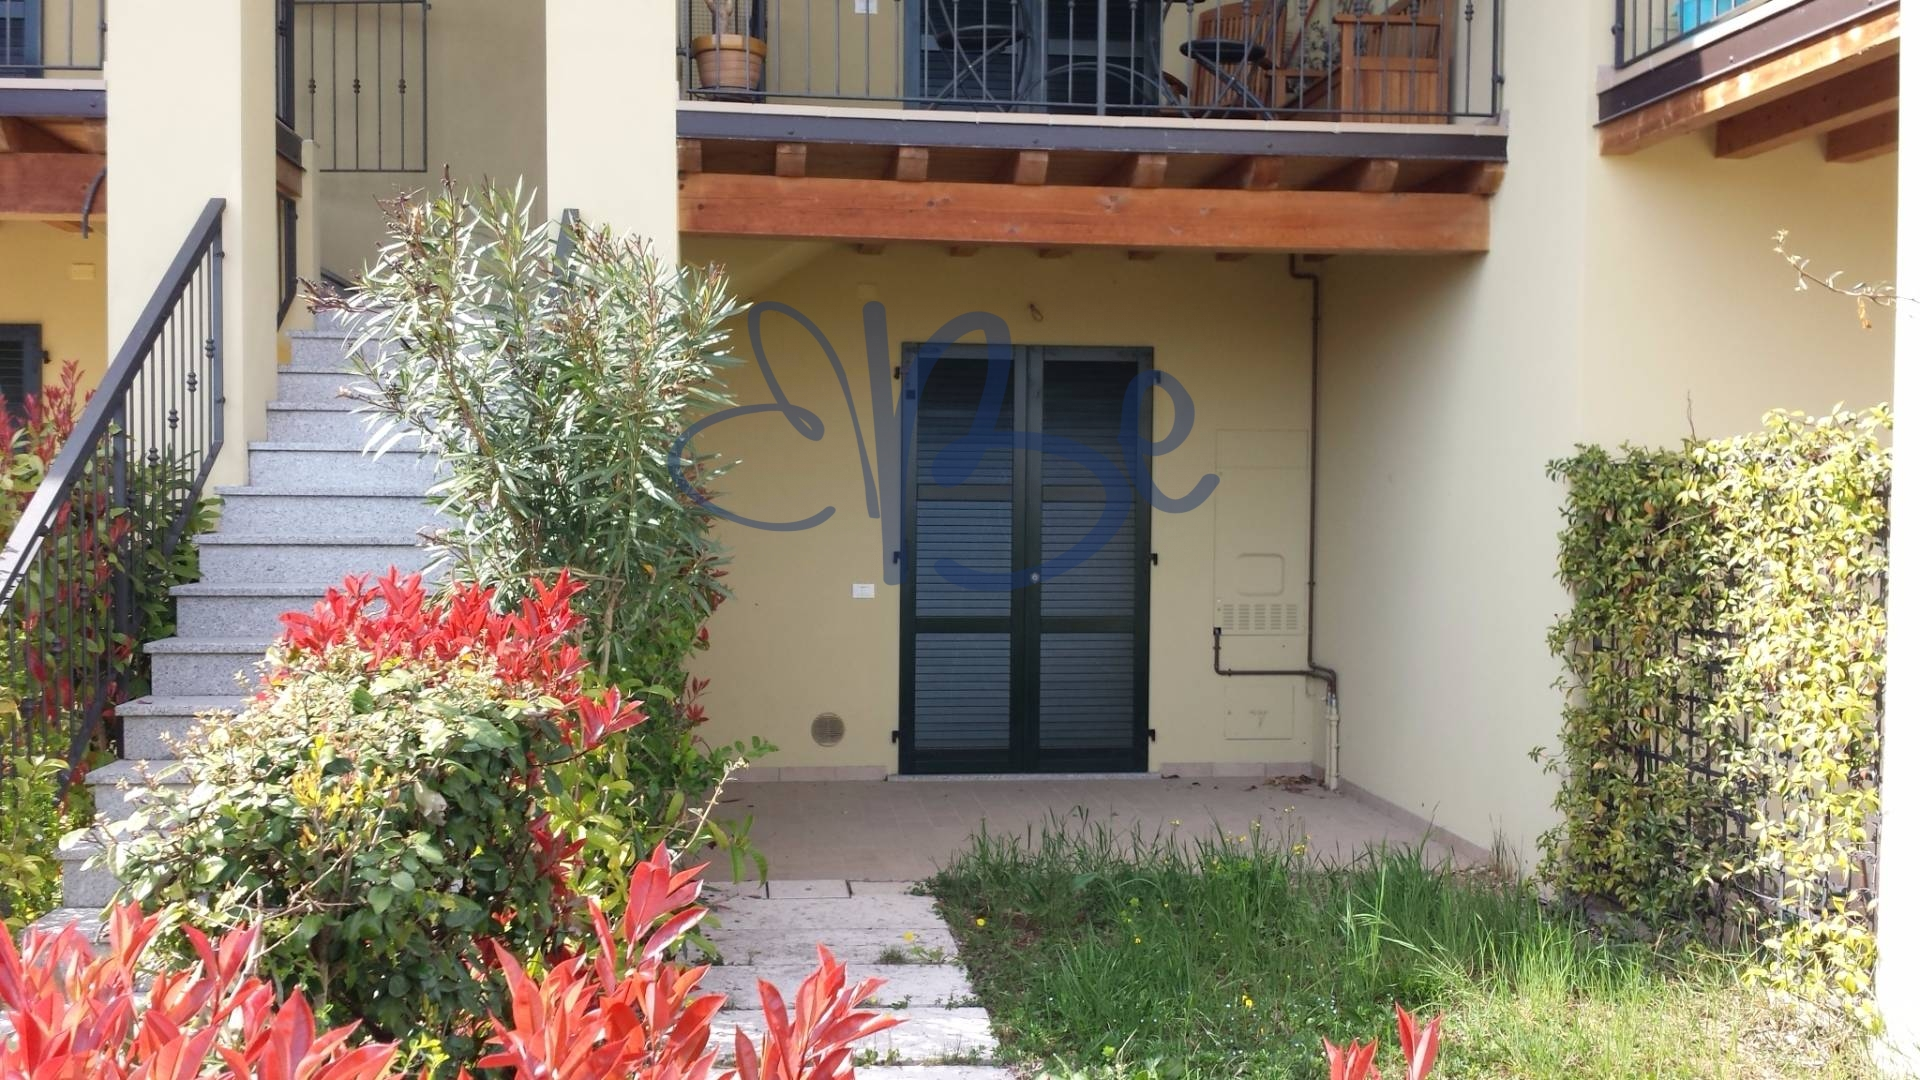 Bilocale Puegnago sul Garda Via Predefitte 2